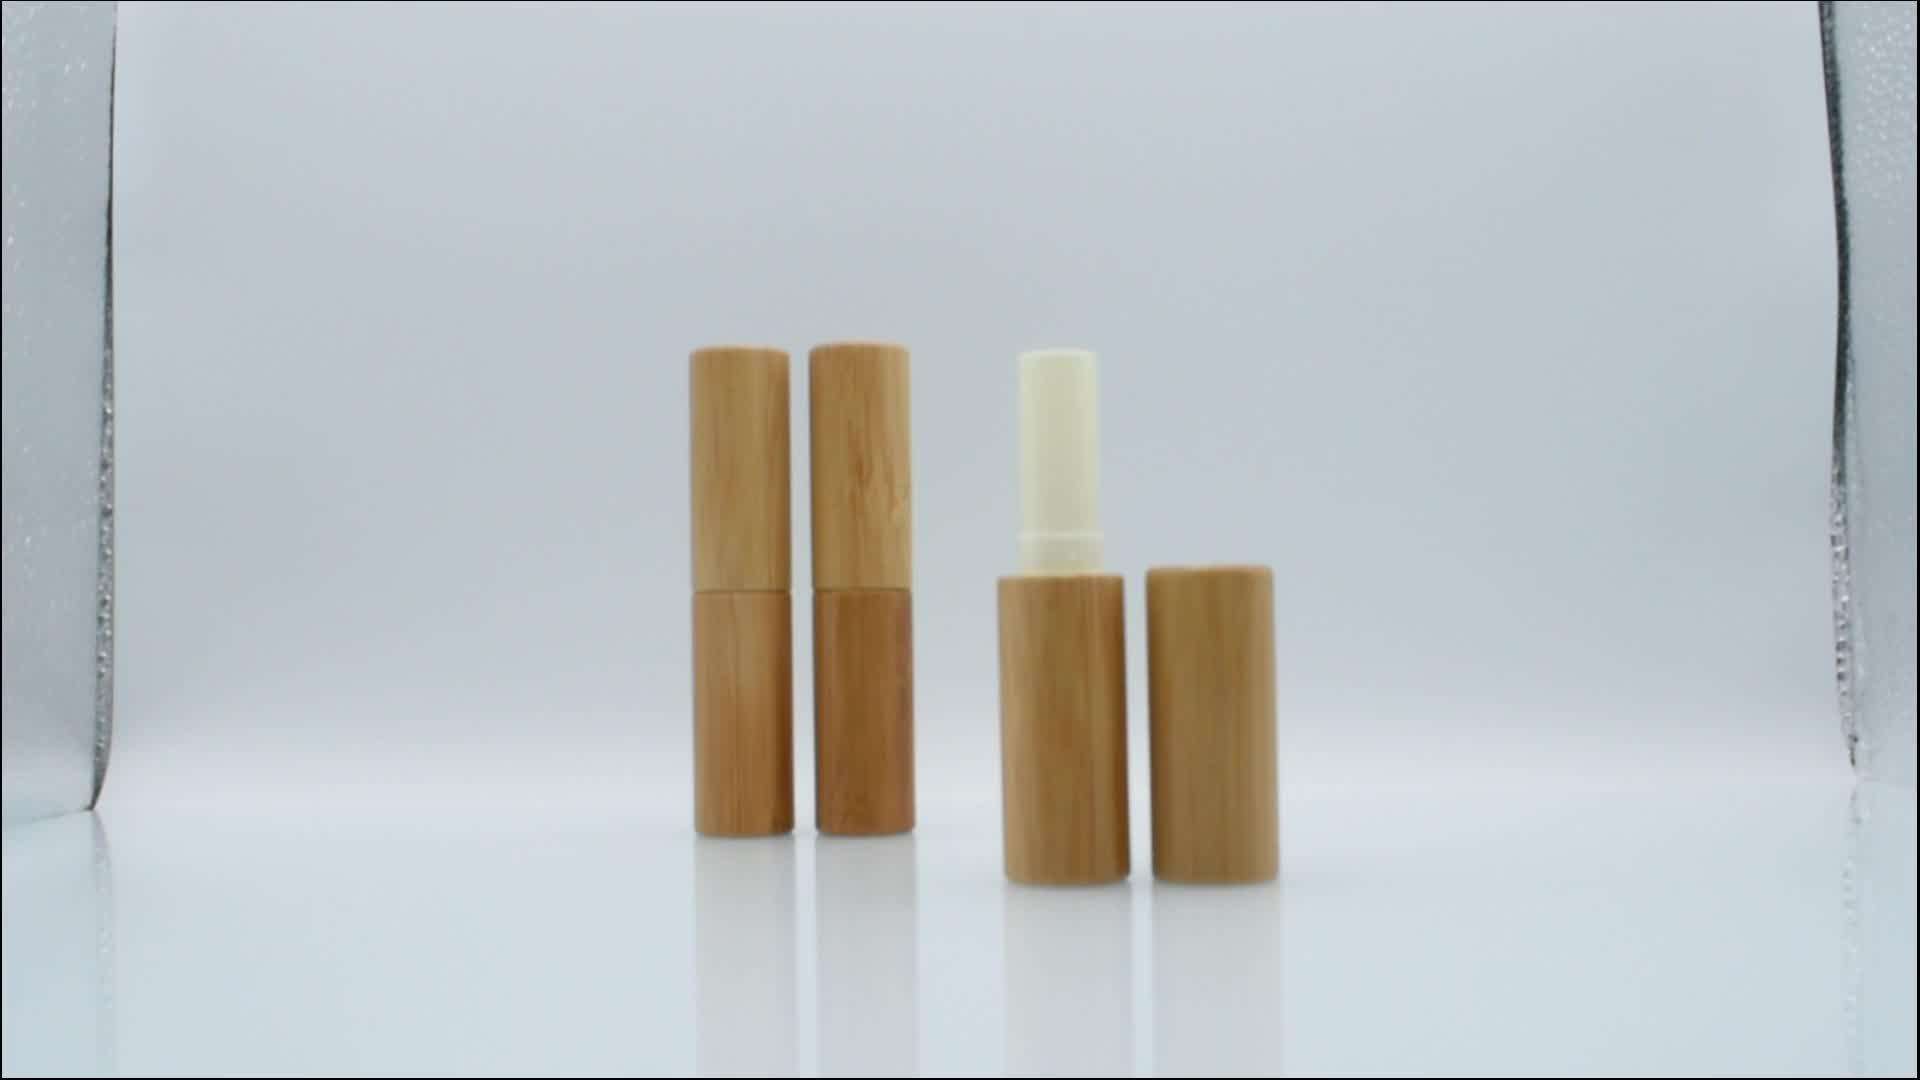 China fornecedor Ambiental 5 ml 5g 4 ml 4g tubo batom lip balm tubo de bambu de madeira de bambu